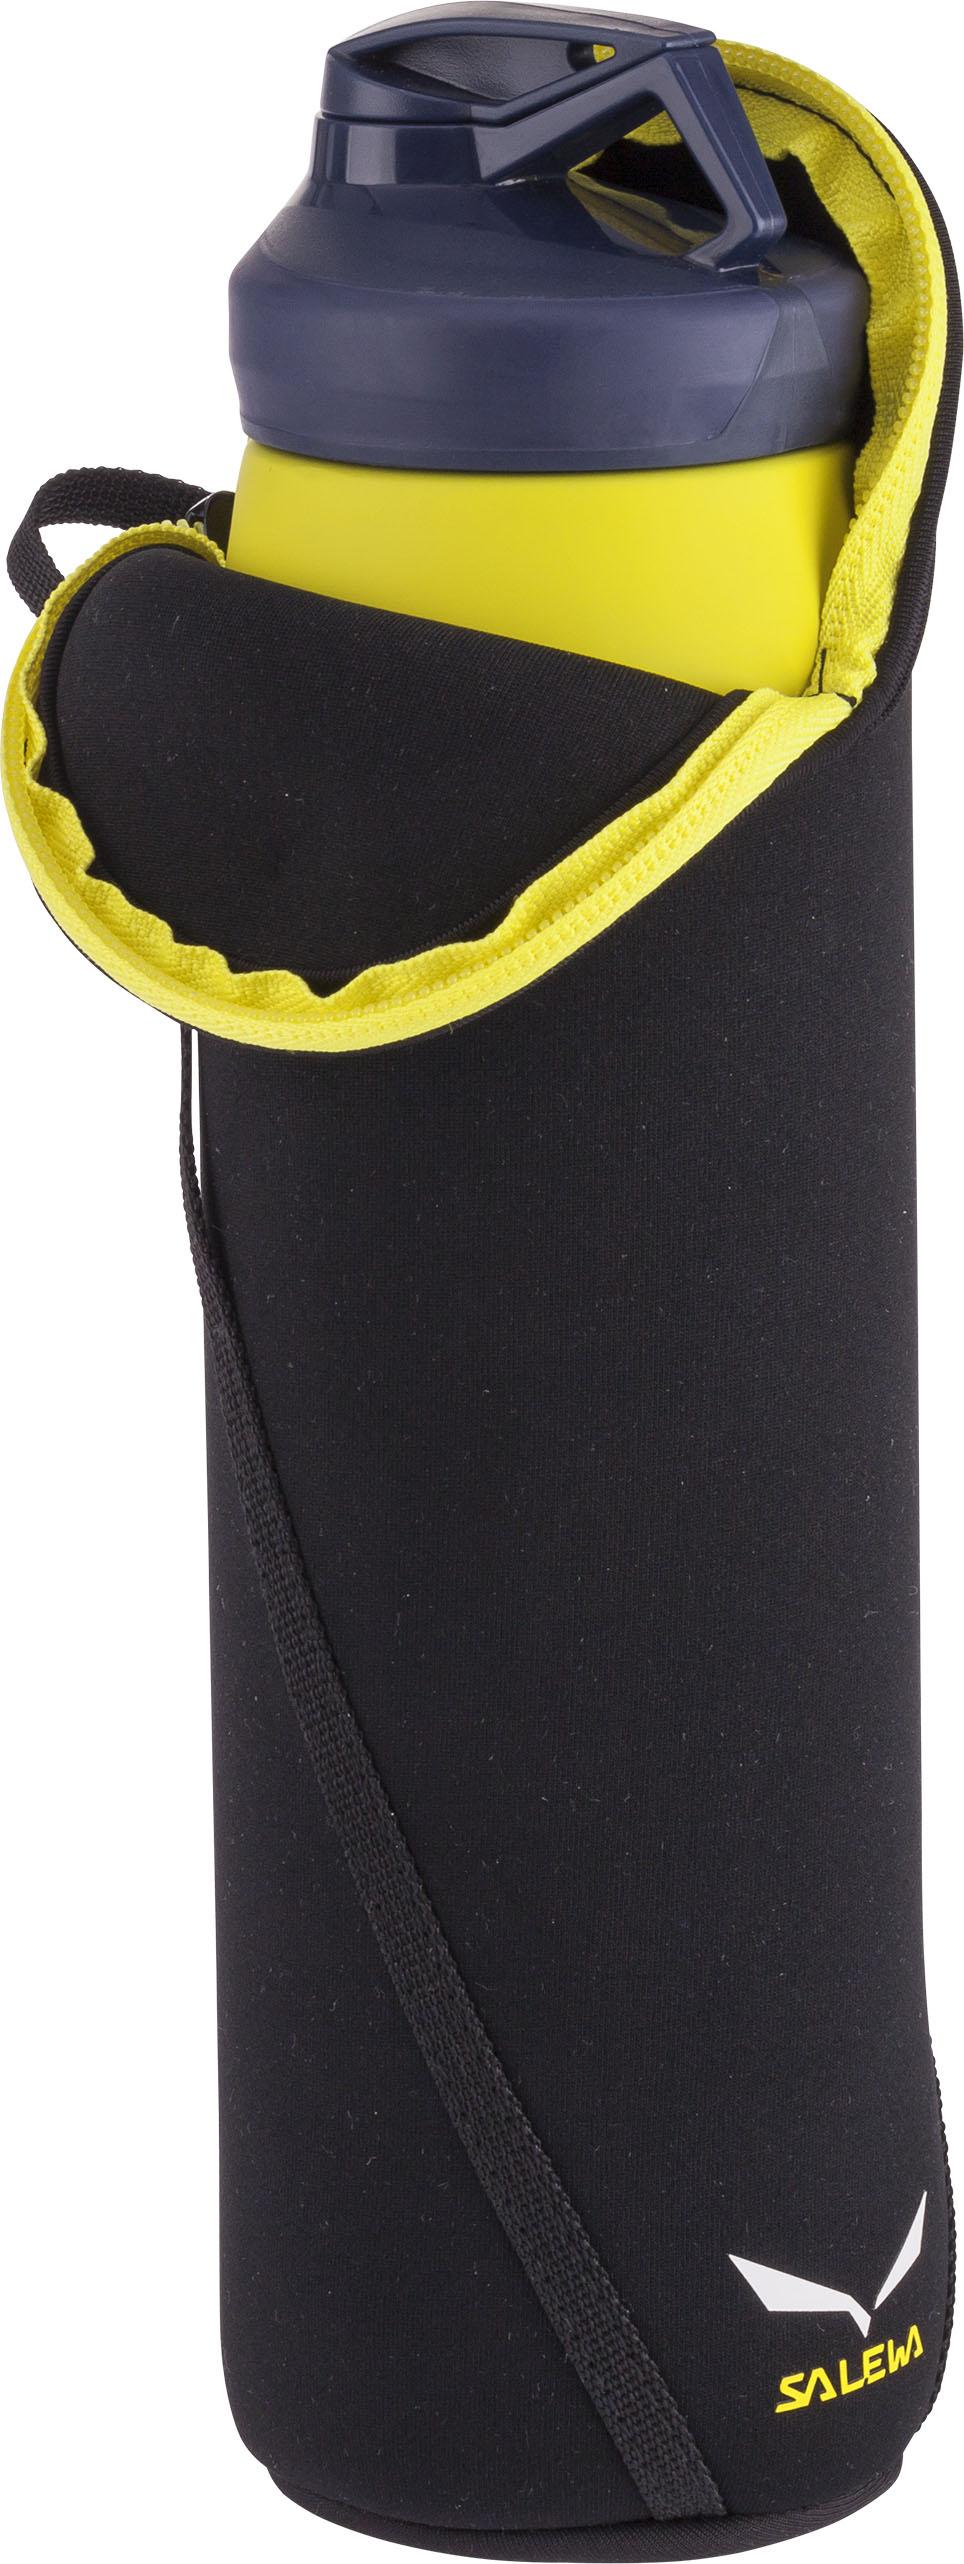 Чехол Для Фляги Salewa Accessories Insulation Cover 0,75 L Bottle Black